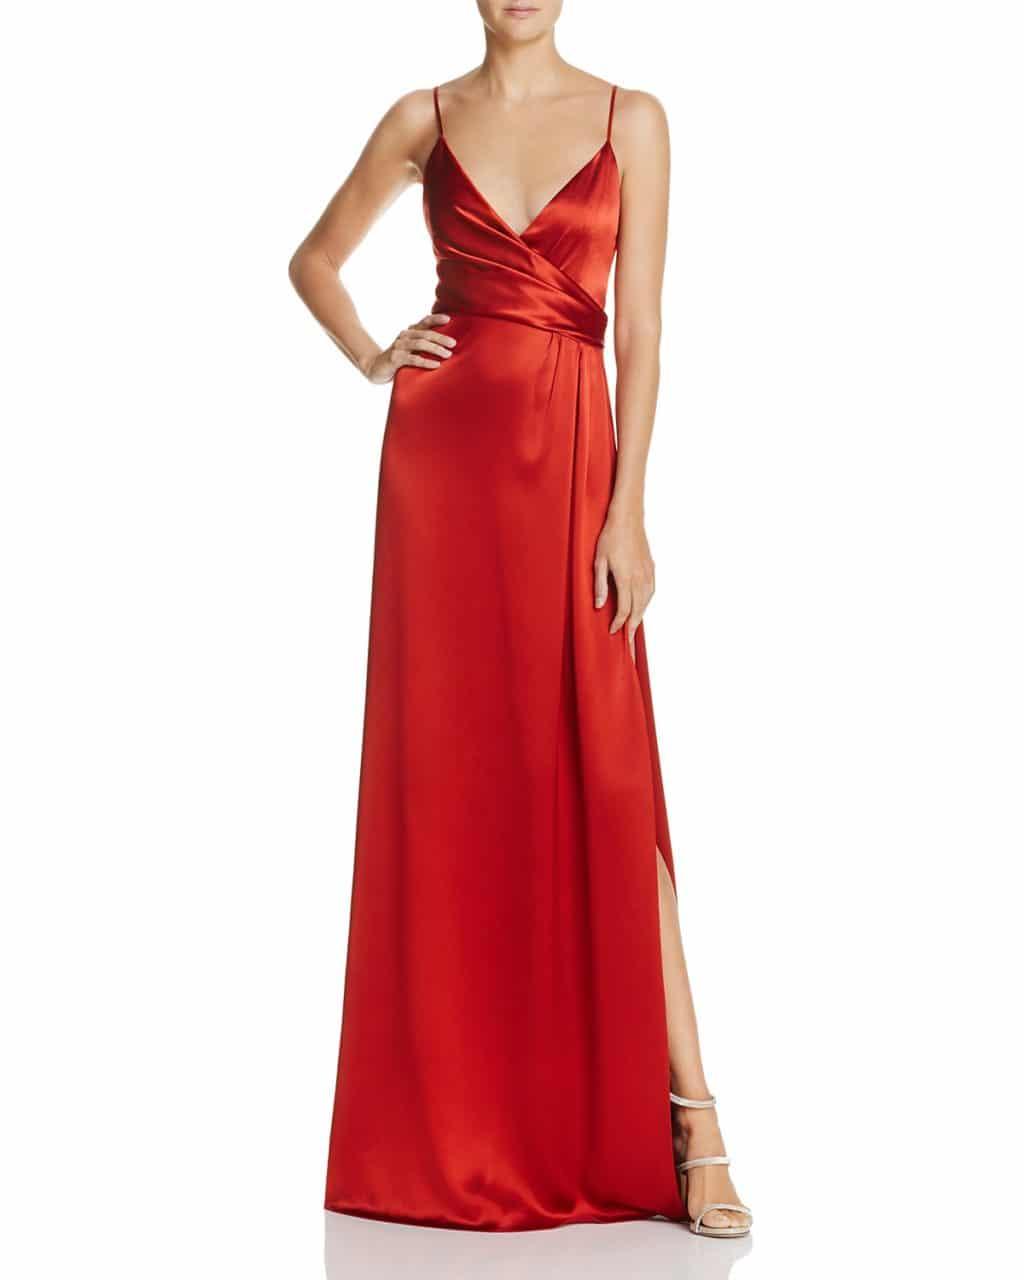 Jill Jill Stuart Crossover Slip Rust Orange Gown We Select Dresses